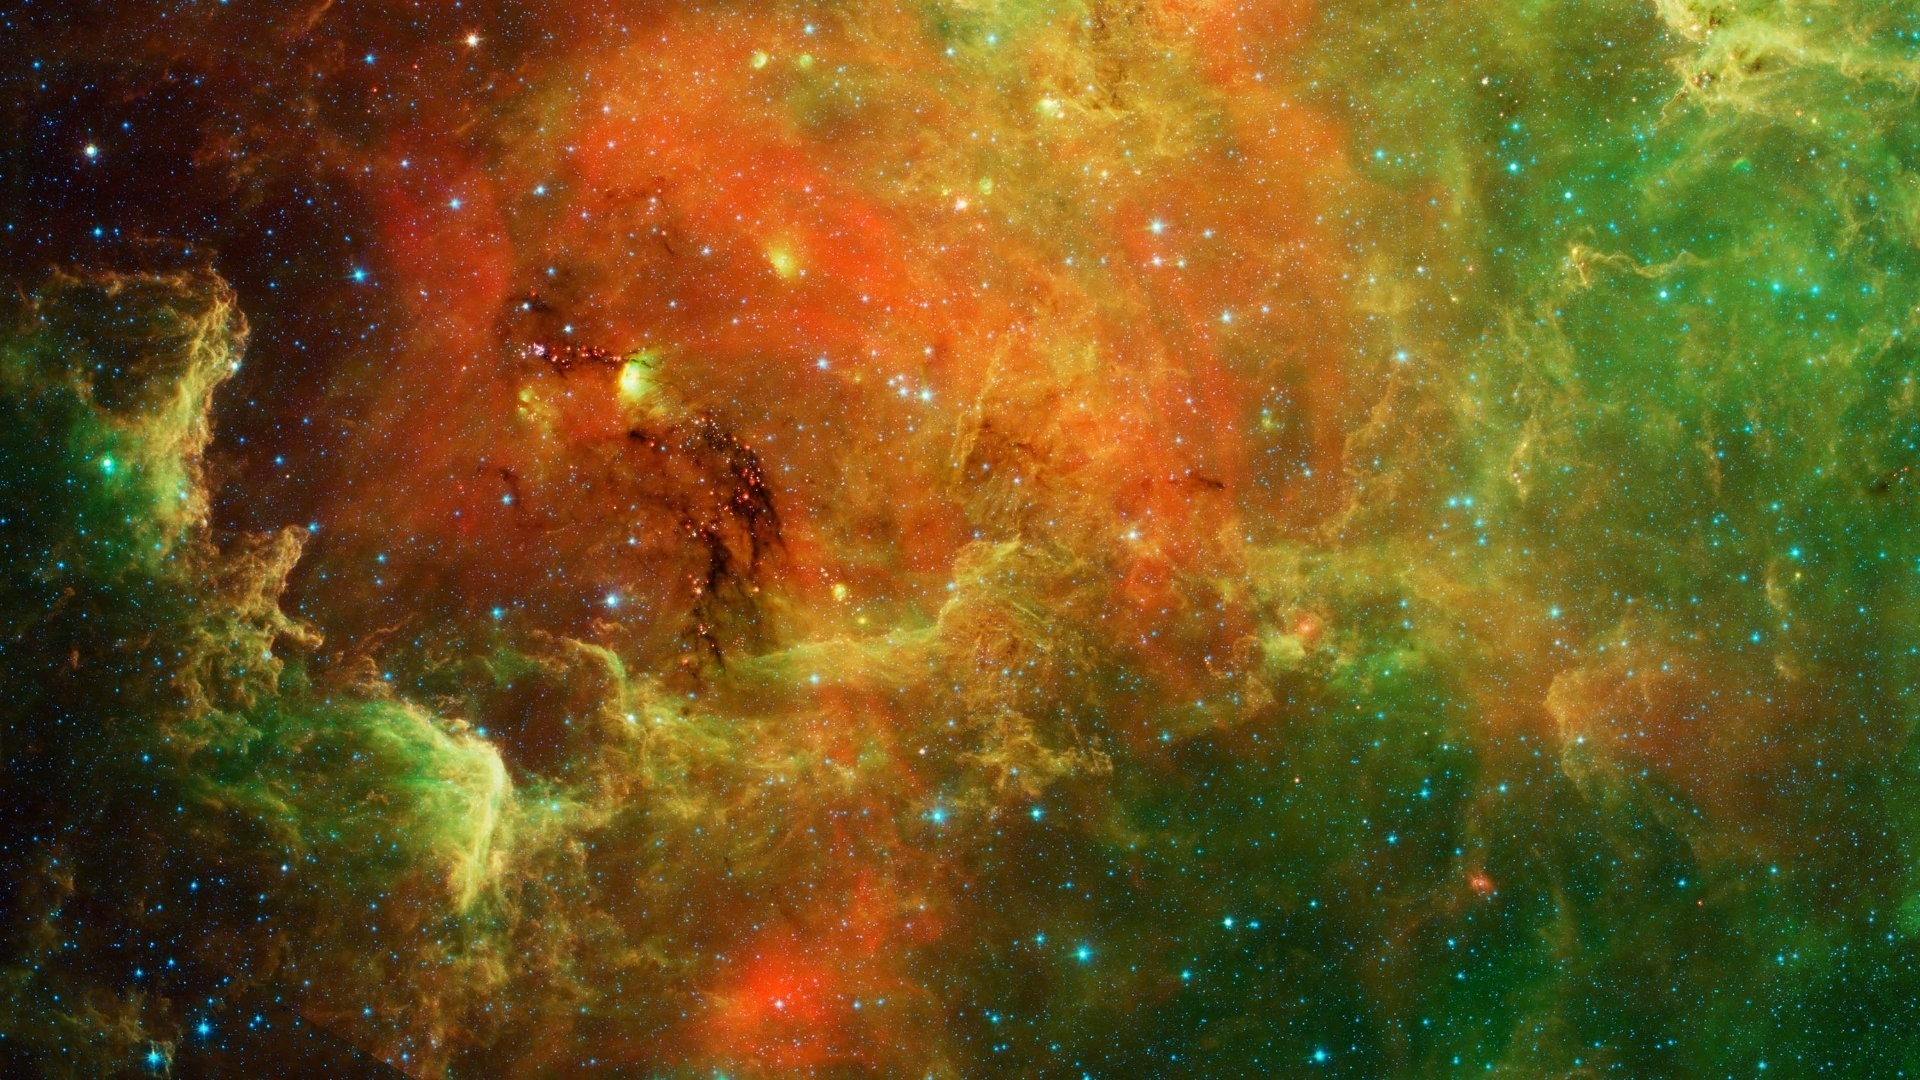 The Great Carina Nebula HD Desktop Wallpaper for K Ultra HD